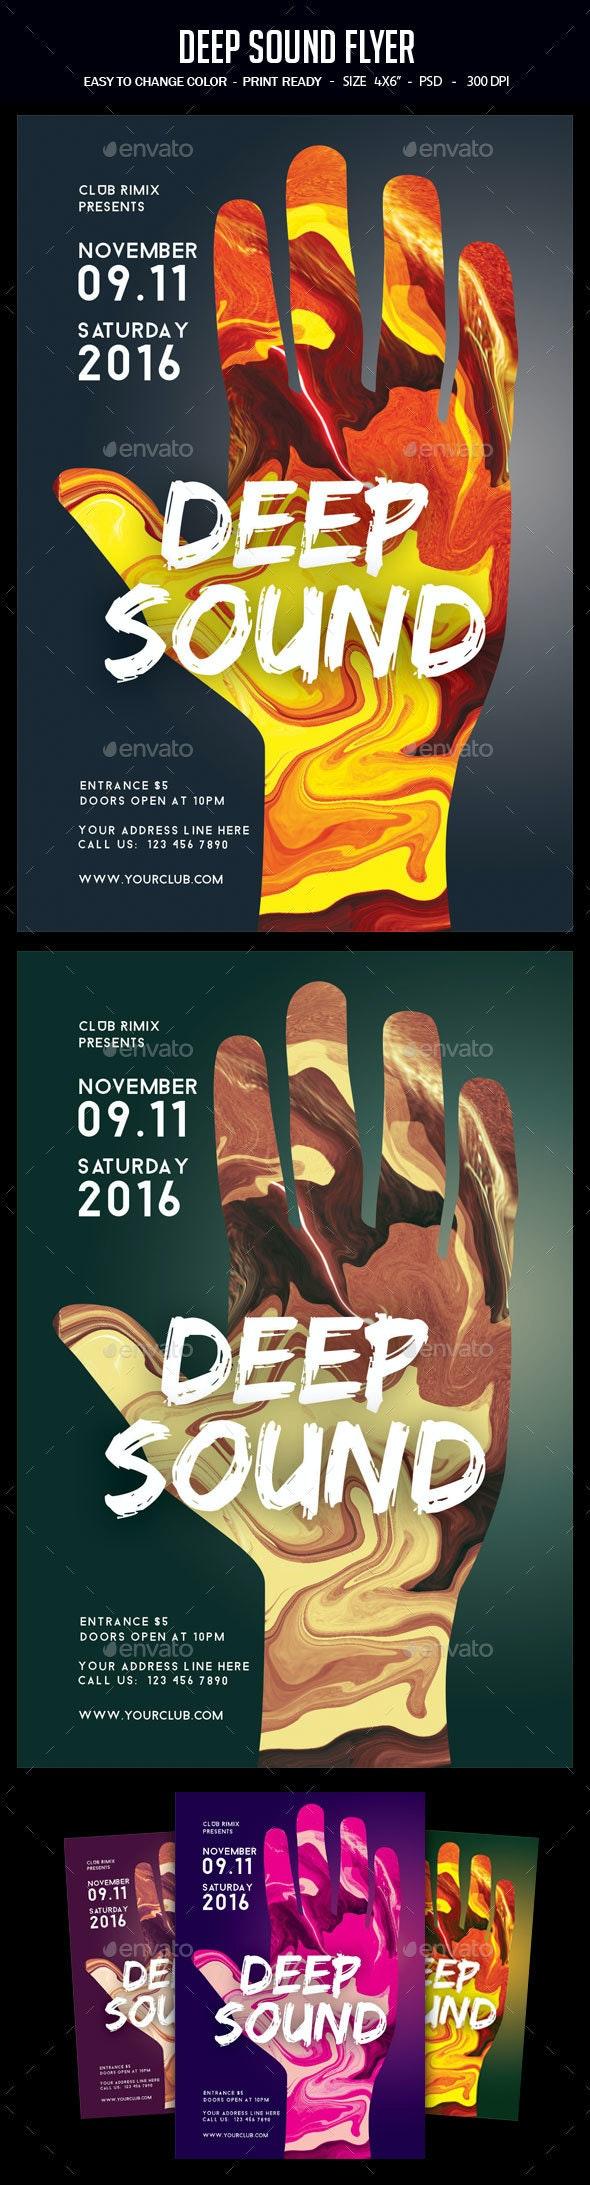 Deep Sound Flyer - Clubs & Parties Events